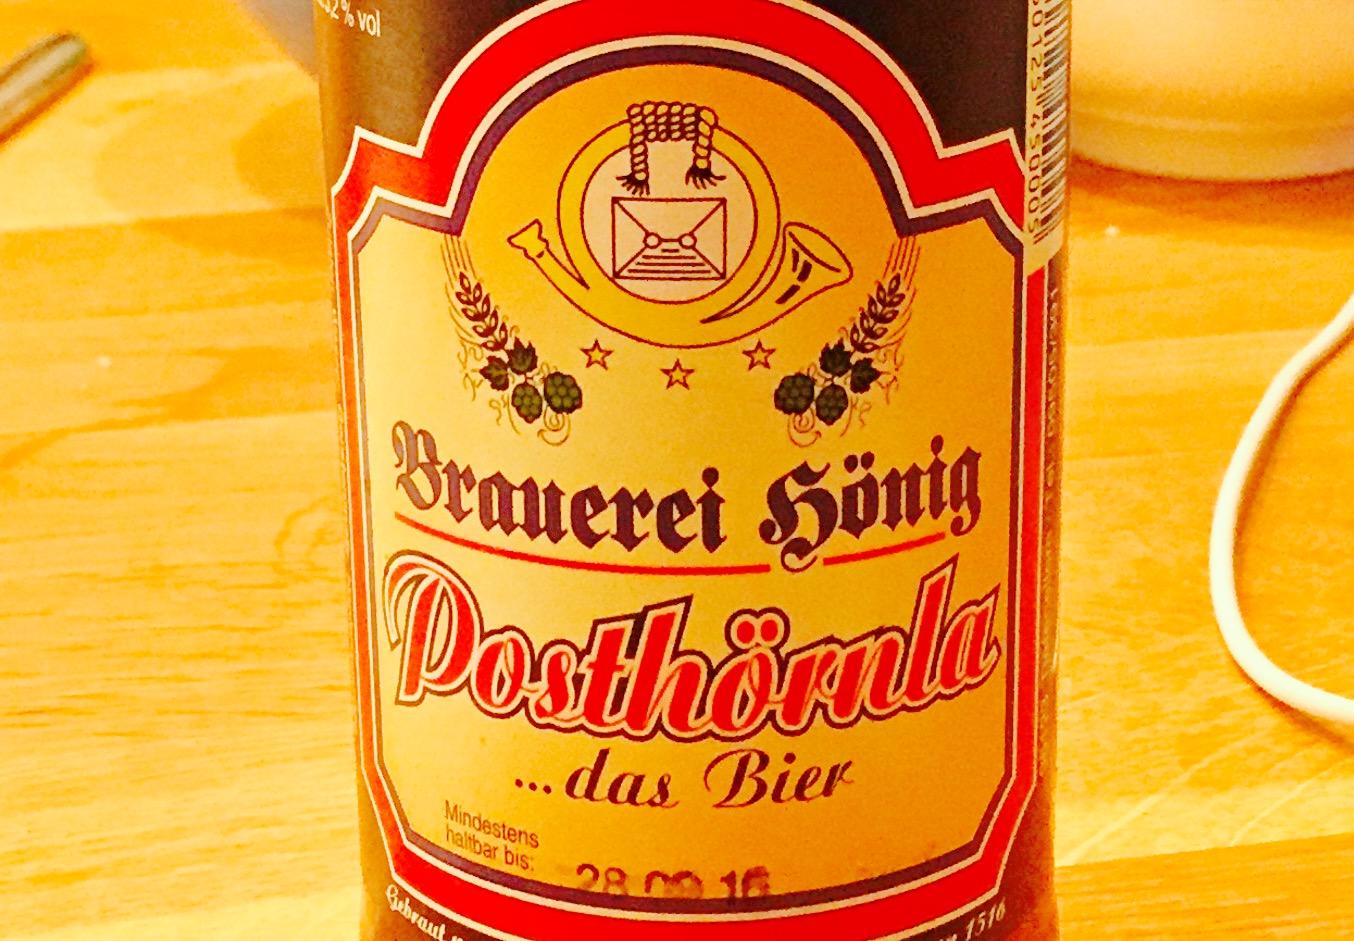 Posthörnla - das Bier